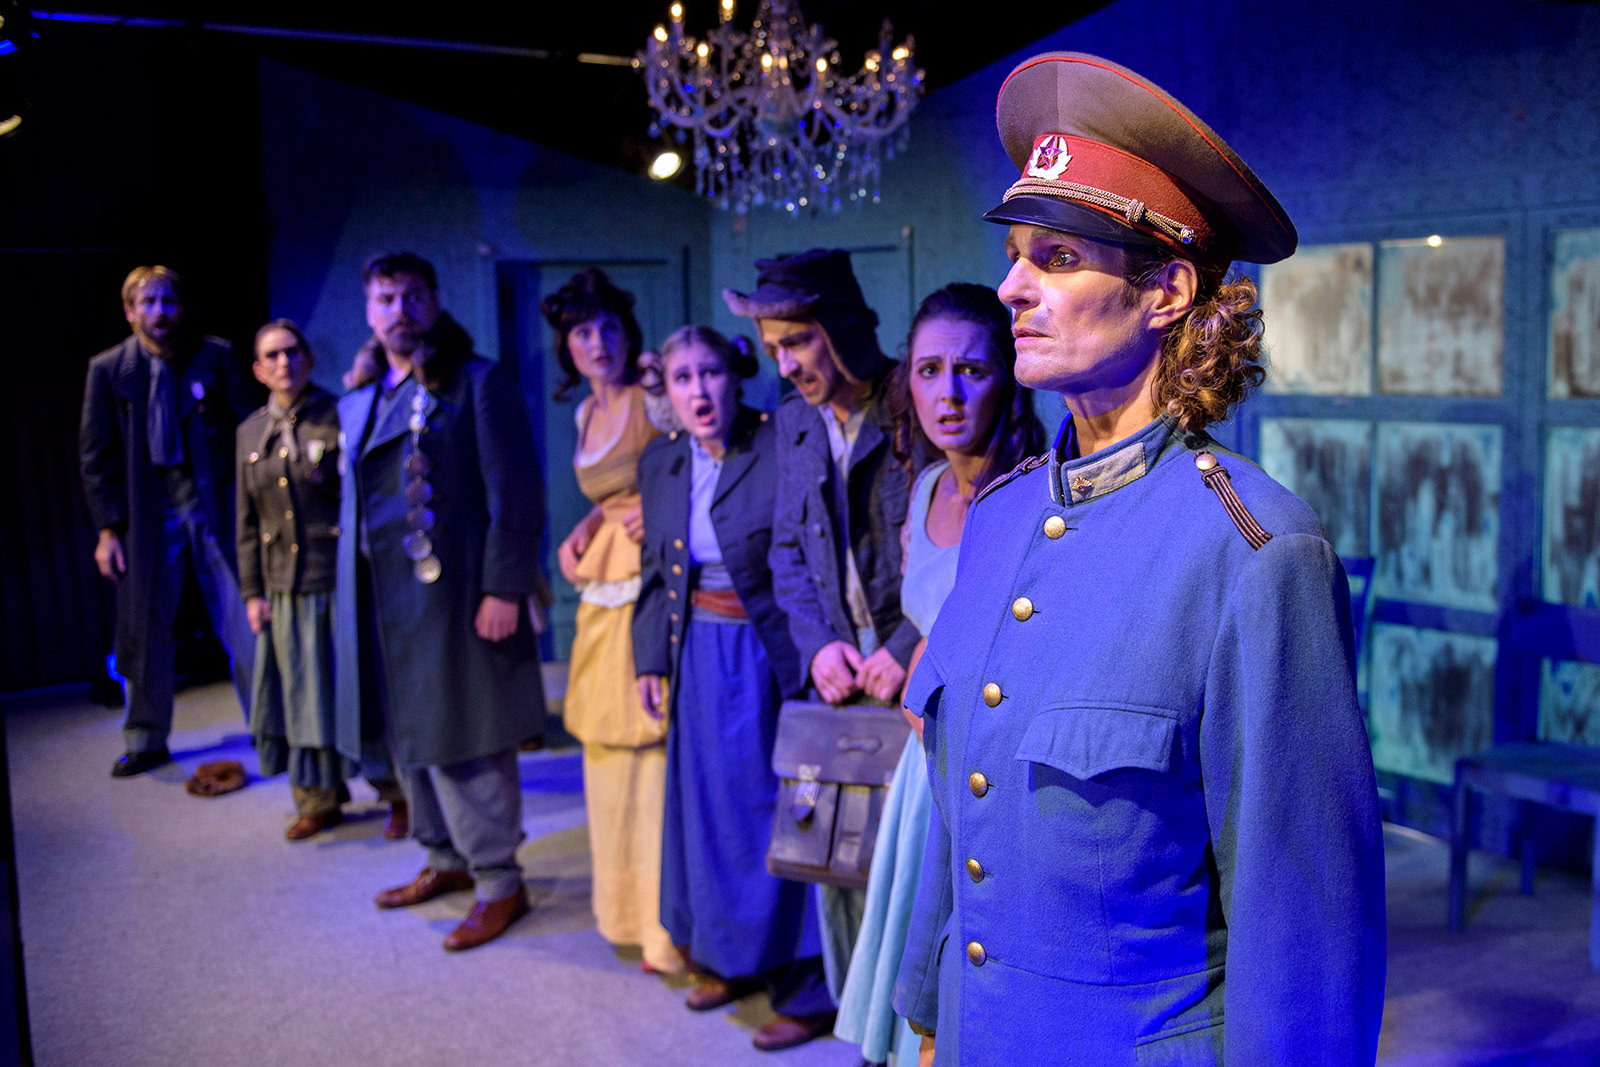 theater im enovum in Lüneburg Generalprobe Der Revisor